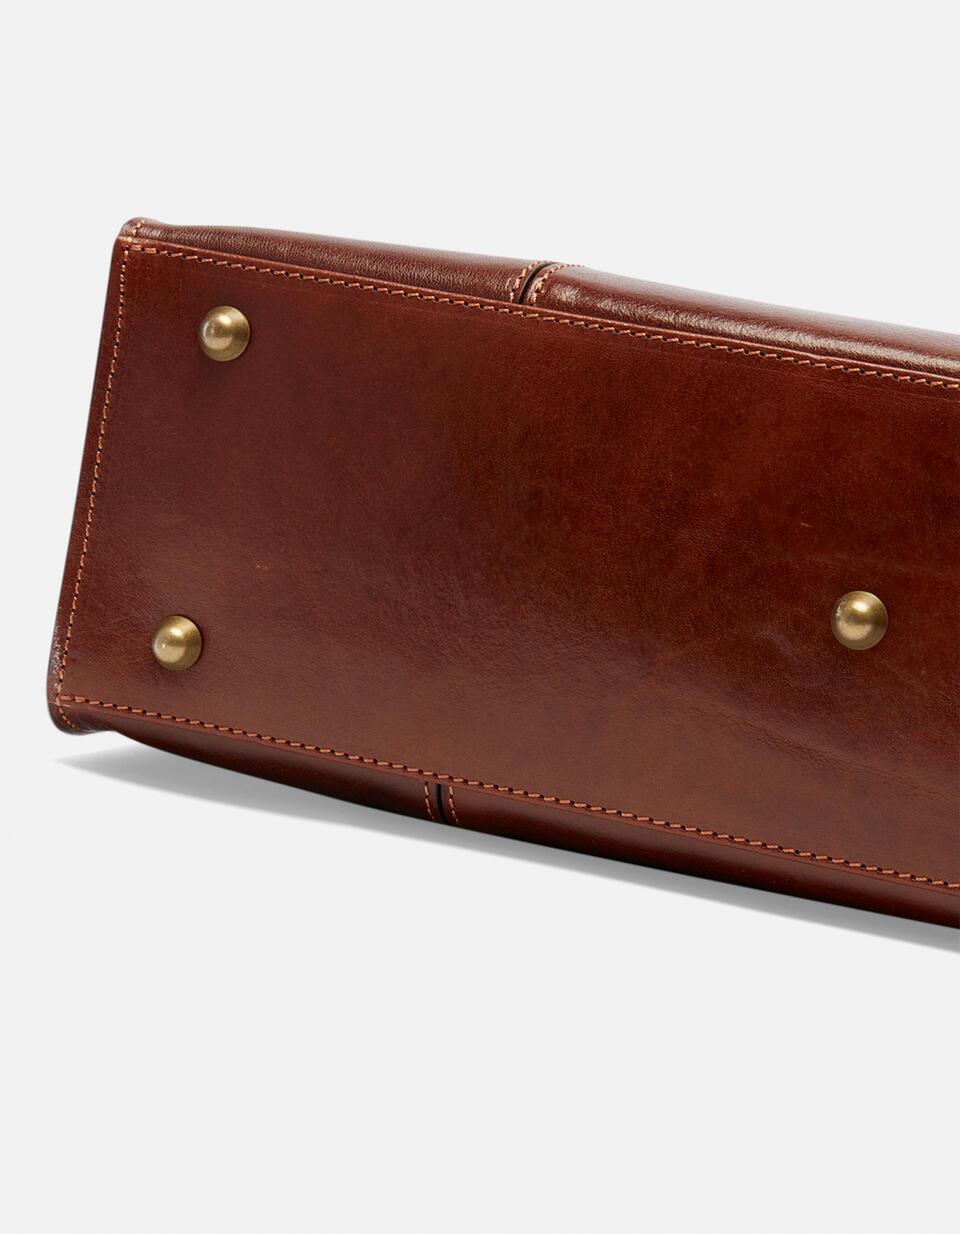 Medium leather shopping bag with adjustable buckle handles MARRONE Cuoieria Fiorentina